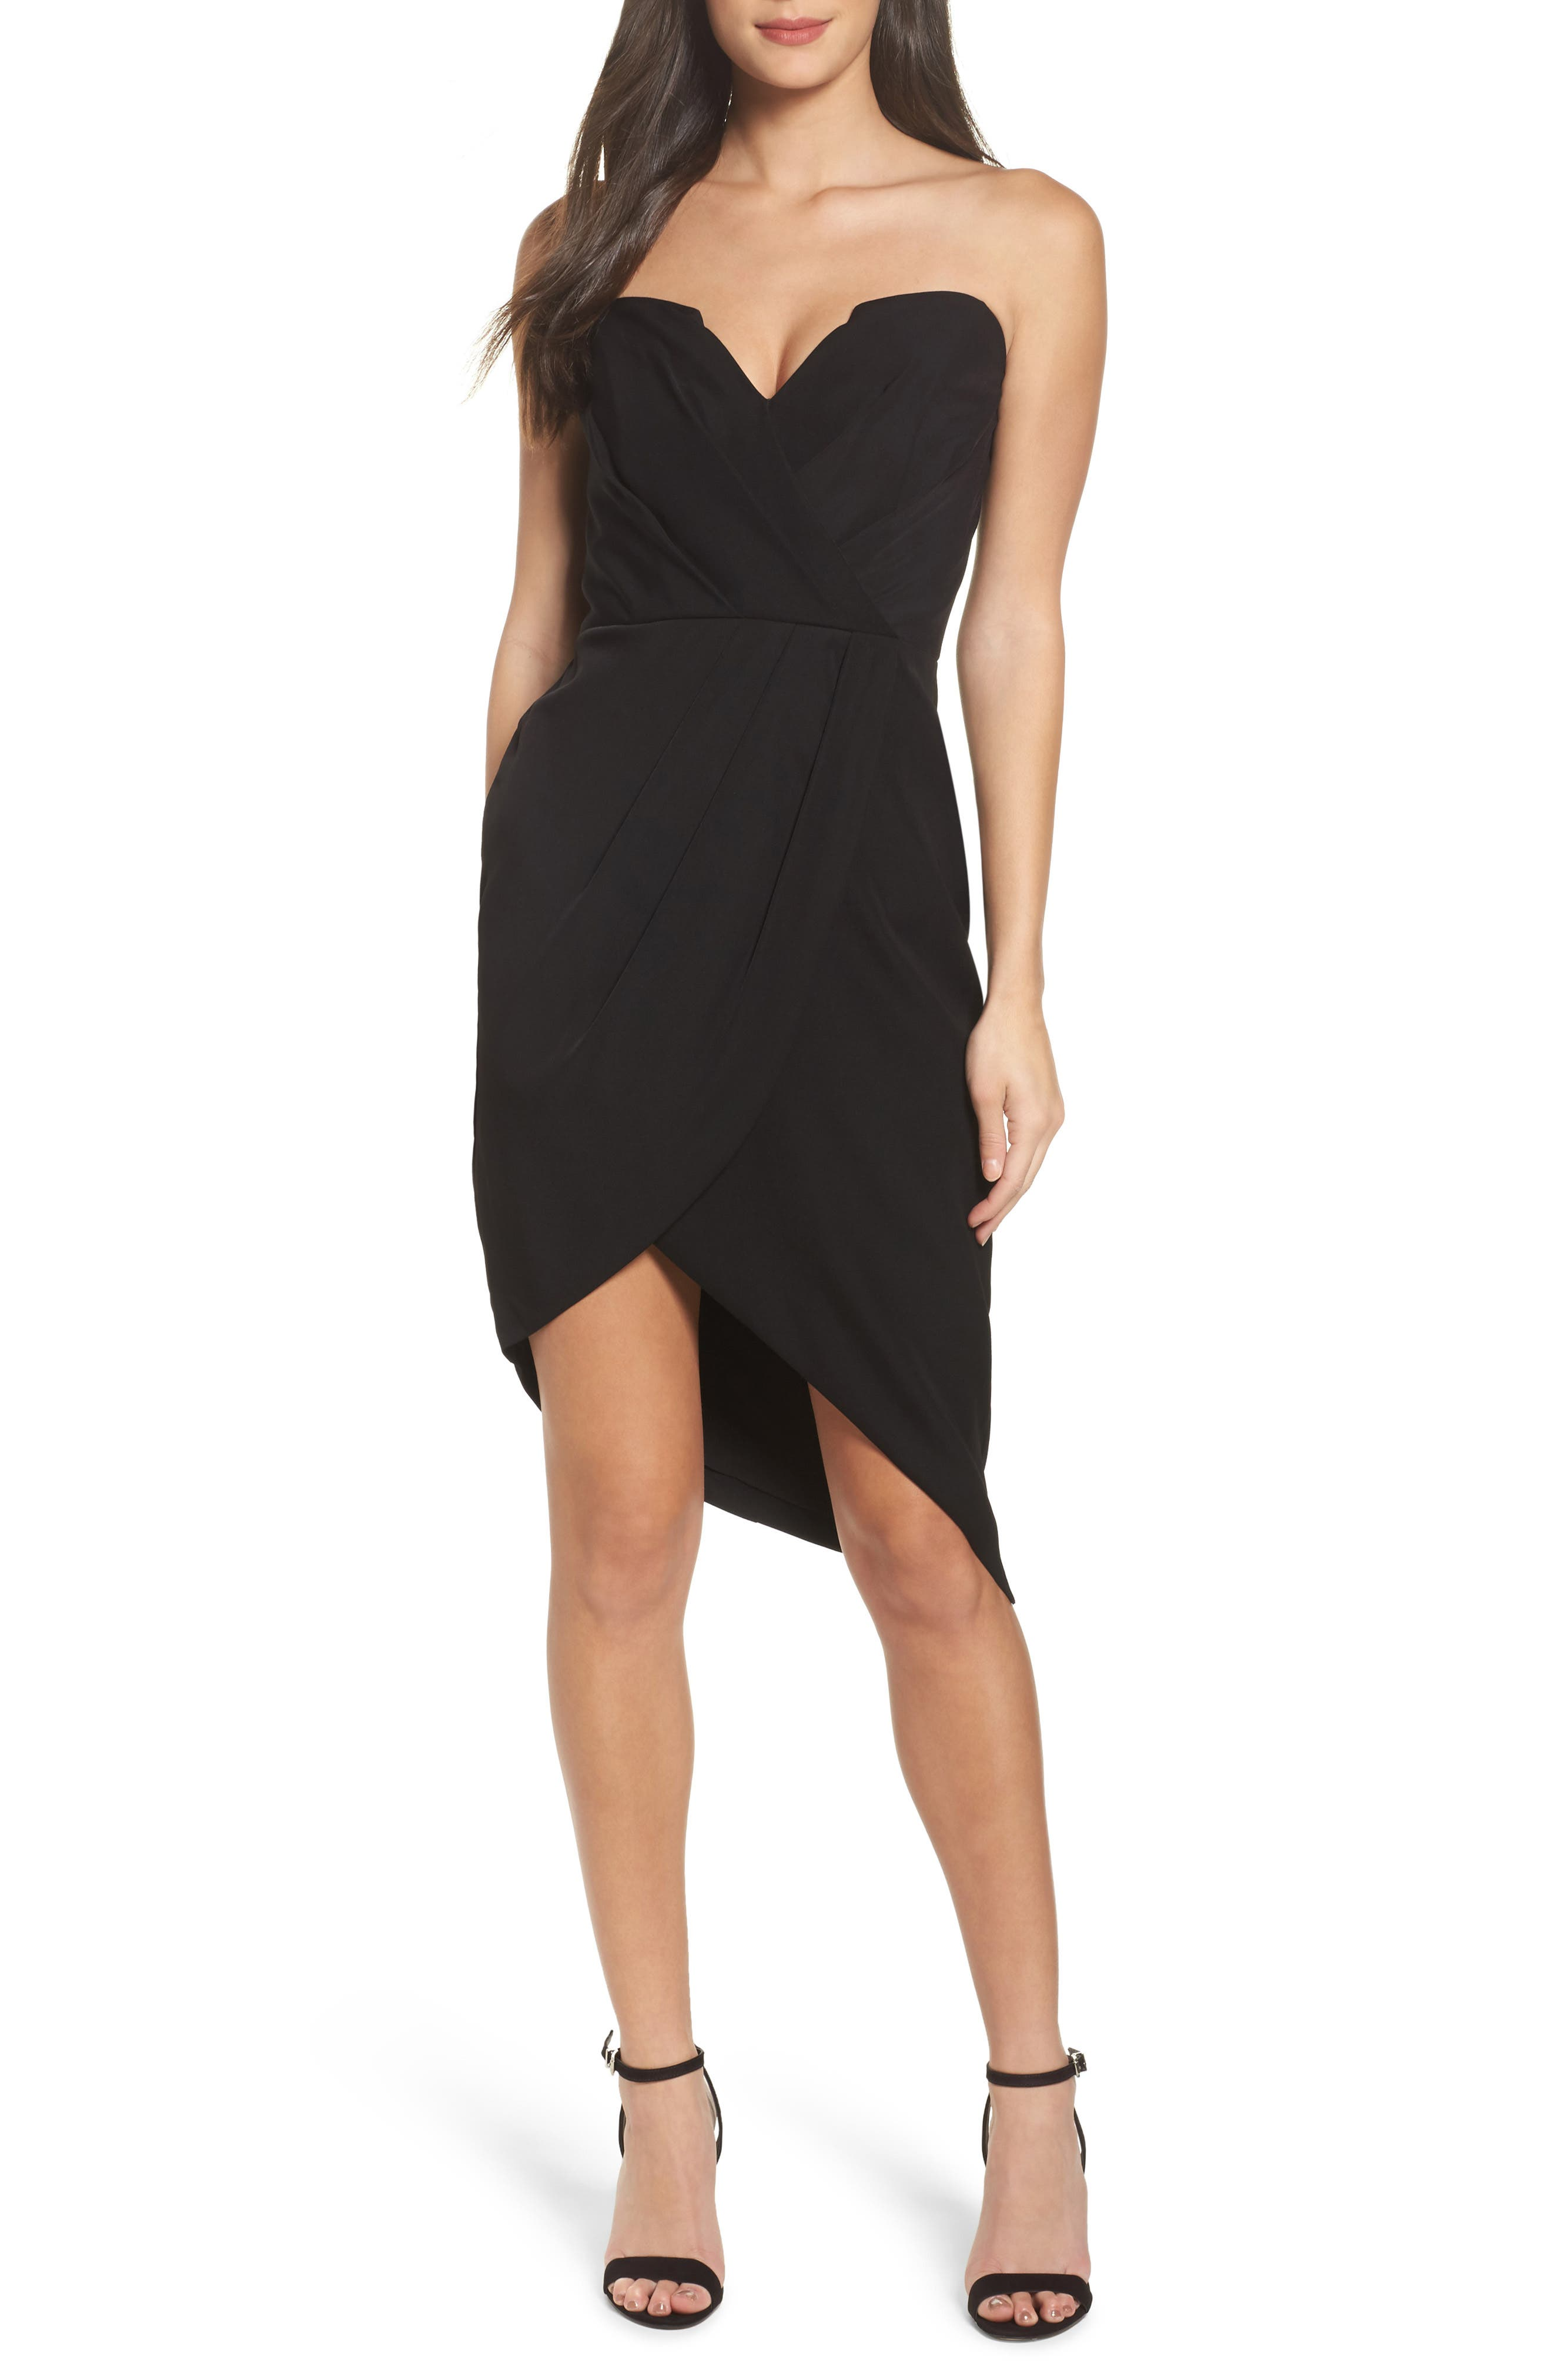 Loren Strapless Asymmetric Dress,                             Main thumbnail 1, color,                             Black